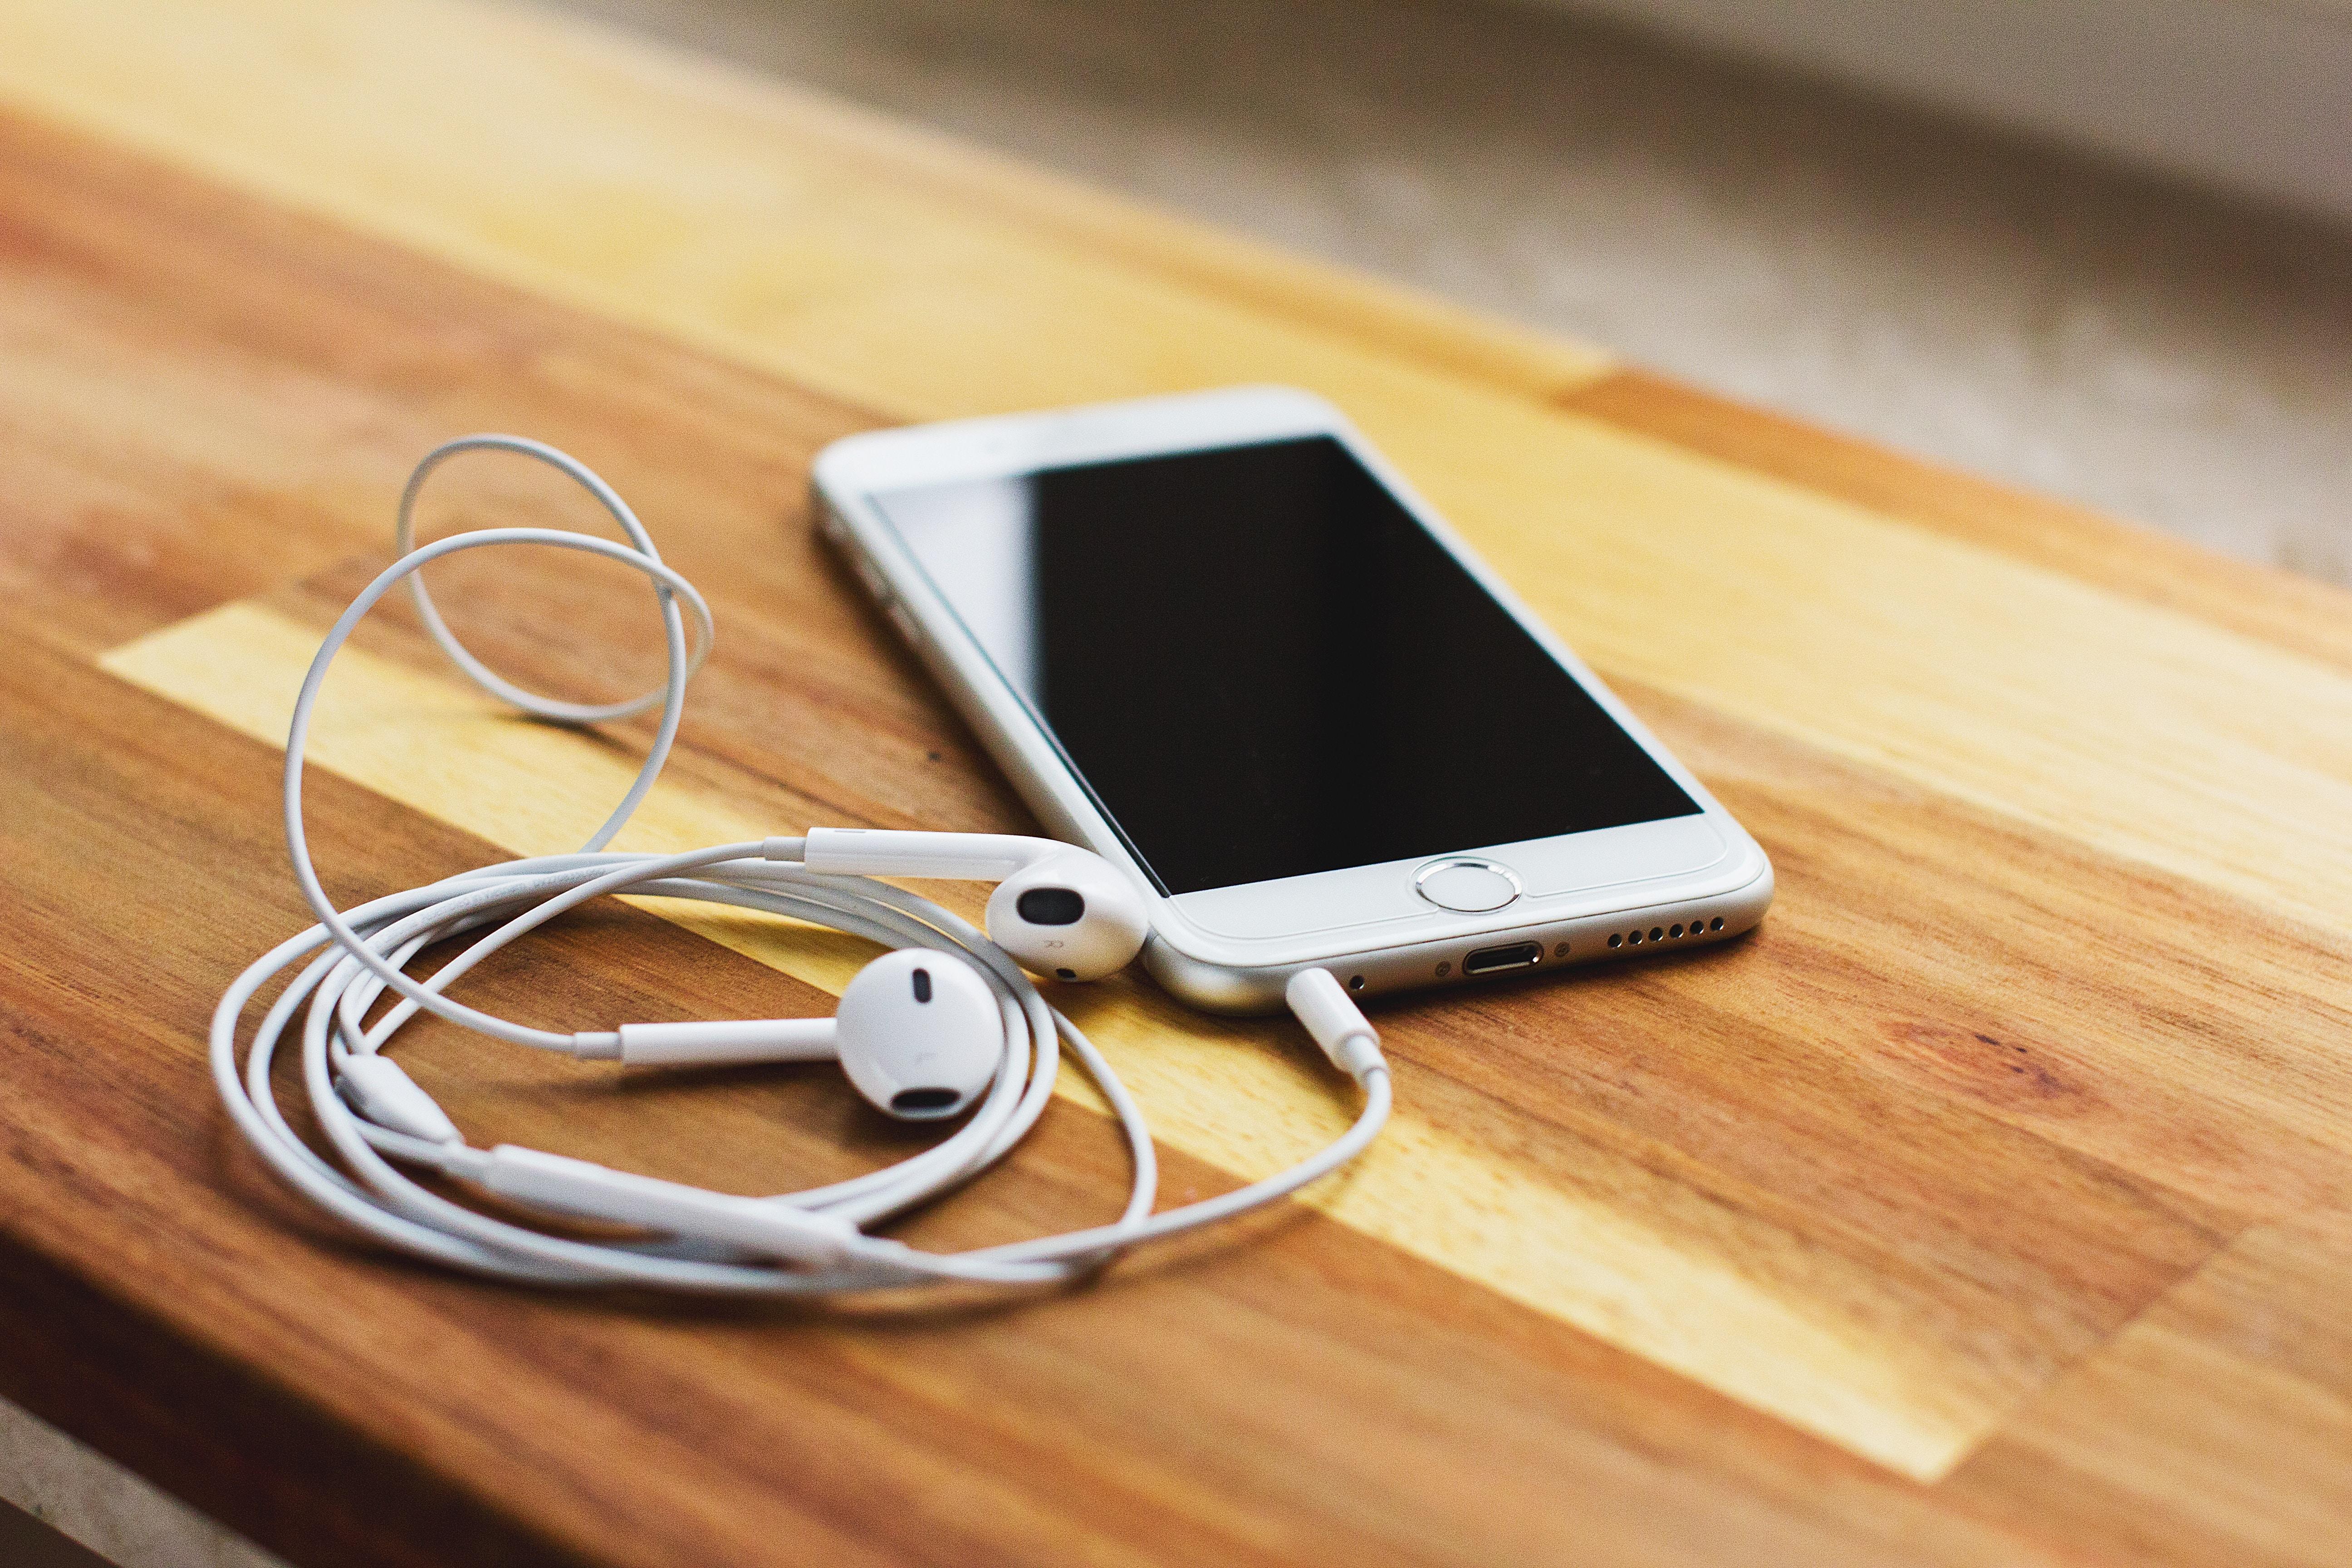 500 Earphones Pictures Download Free Images On Unsplash